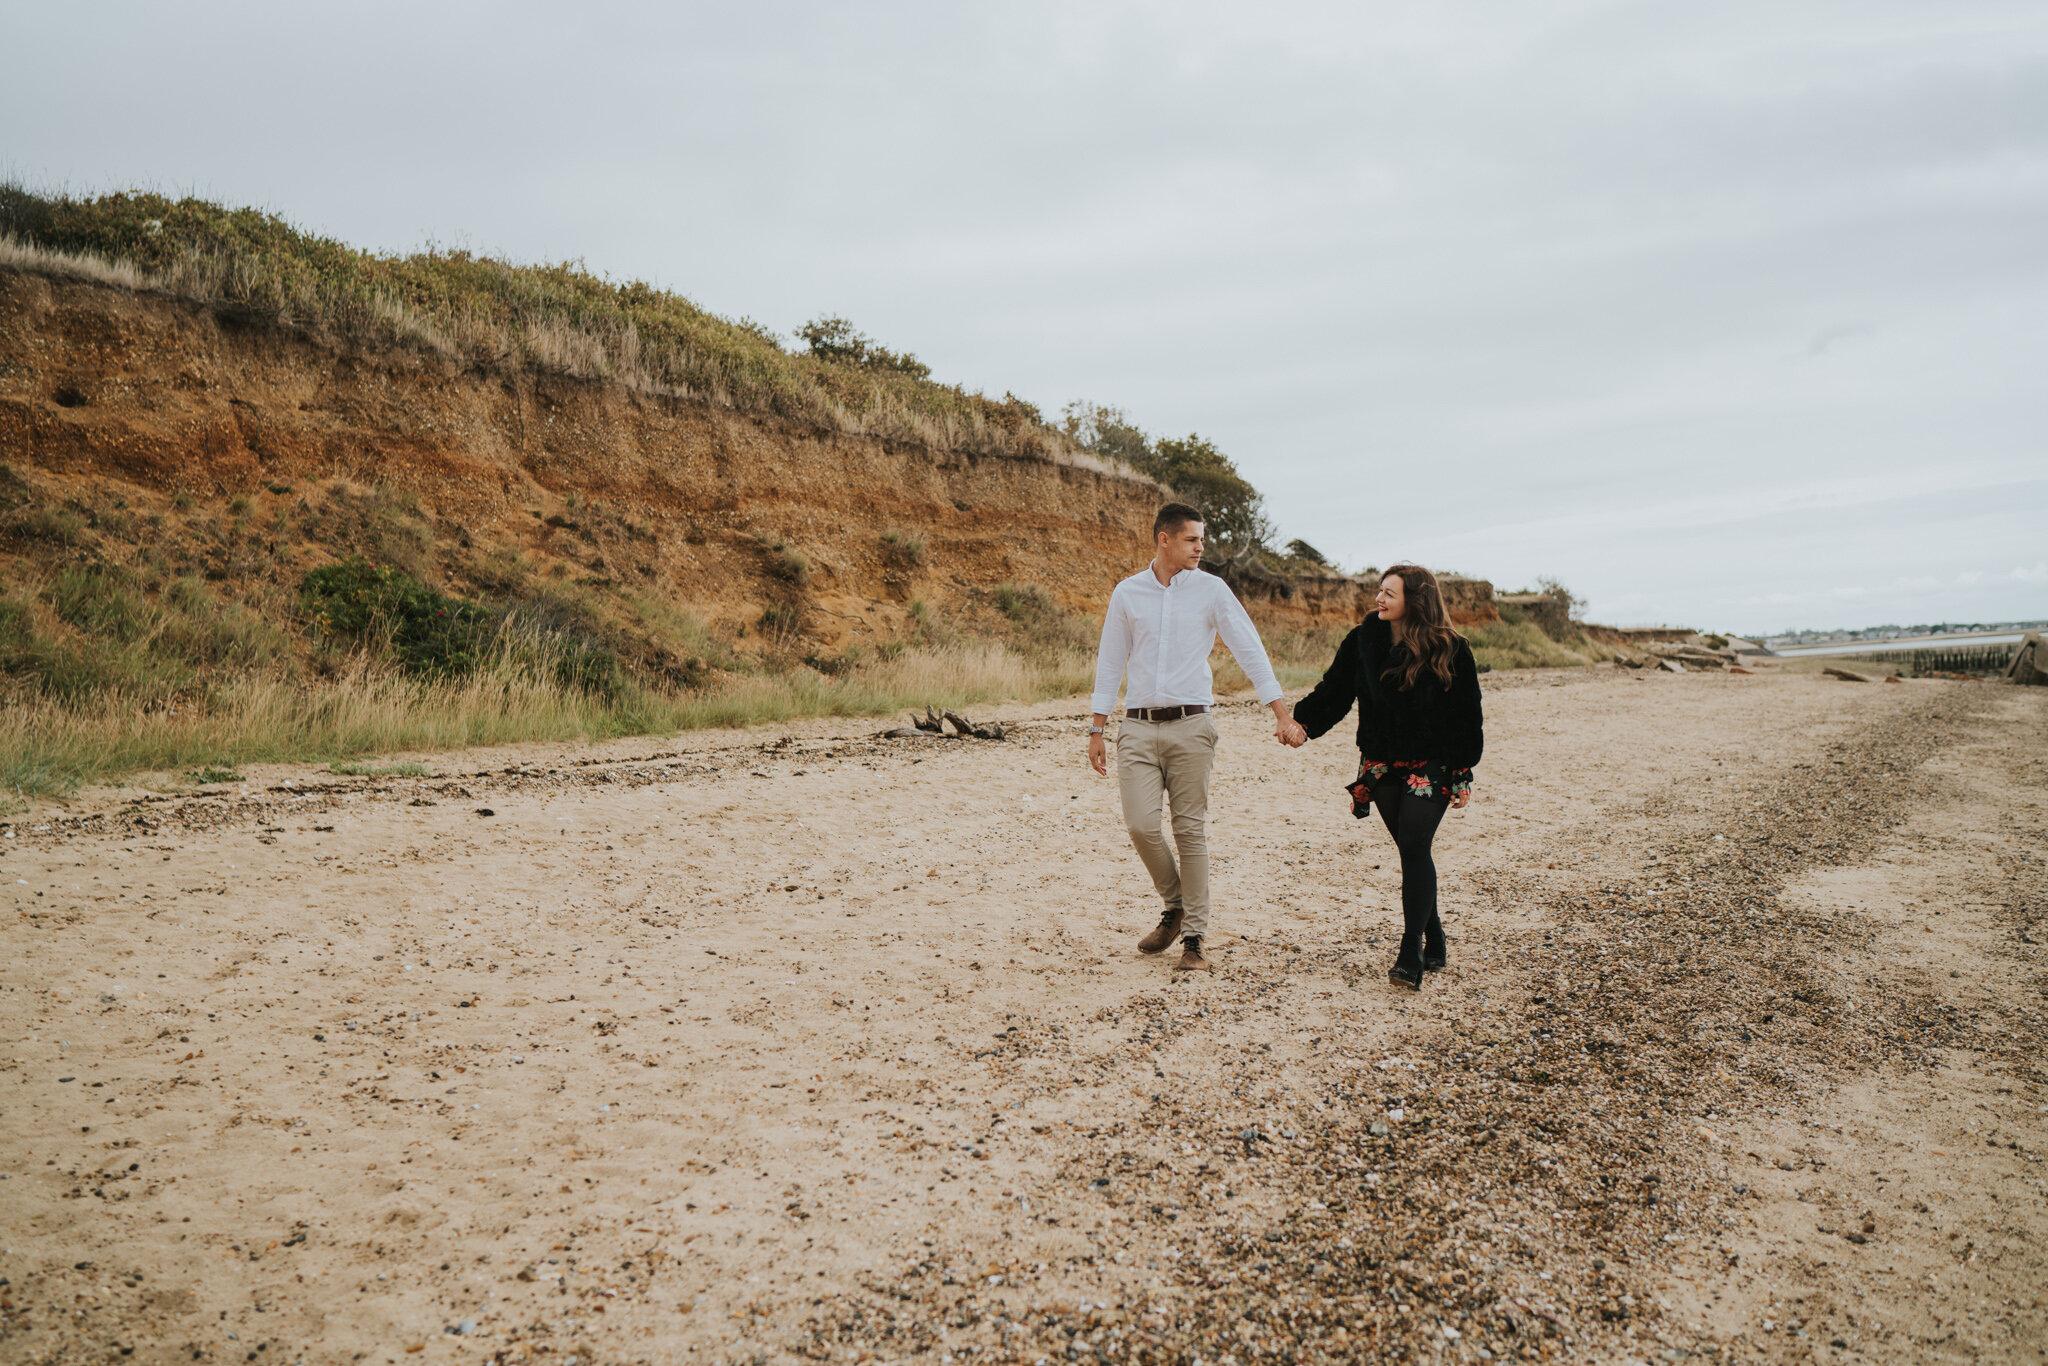 engagement-pre-wedding-hannah-michael-cudmore-grove-east-mersea-grace-elizabeth-colchester-essex-devon-suffolk-and-norfolk-alternative-wedding-and-family-photographer (20 of 51).jpg